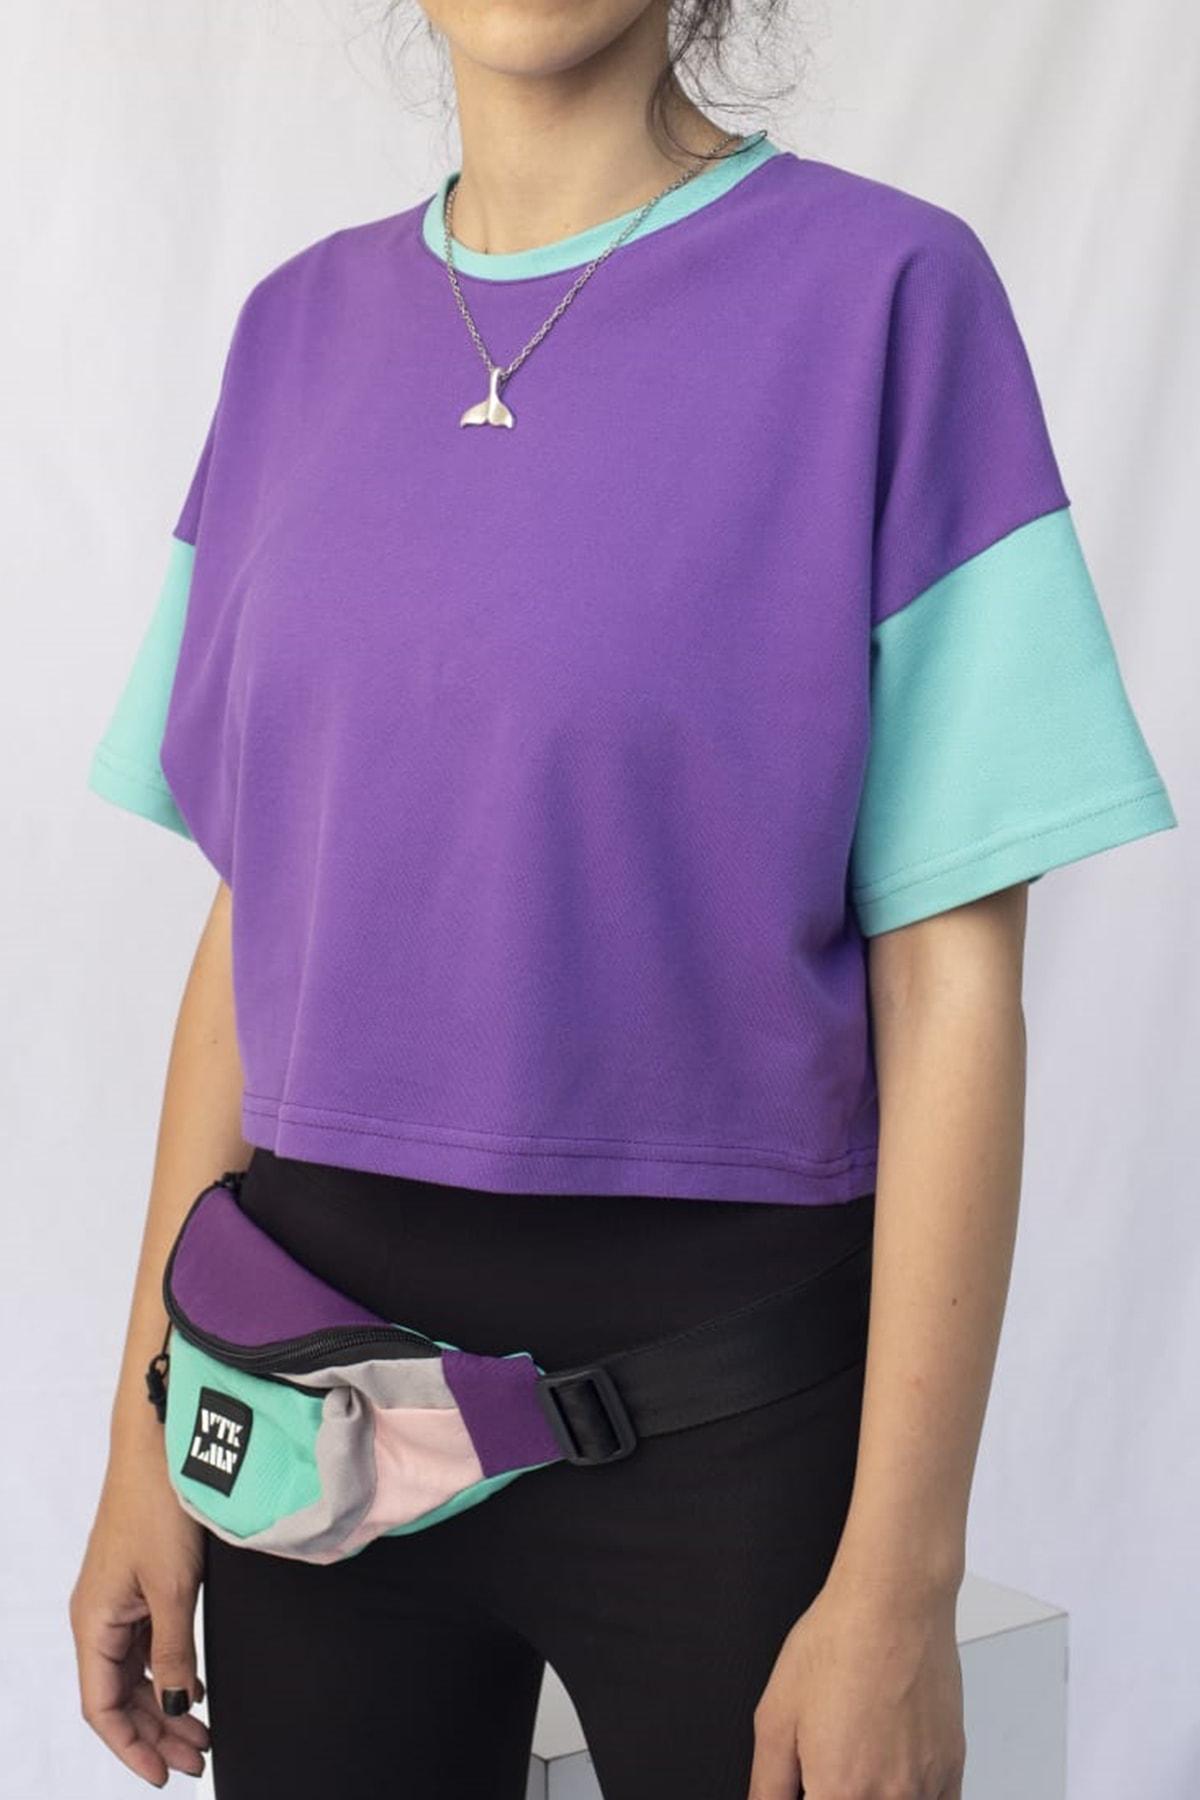 Kadın Mor Mint Renkli Crop Tshirt